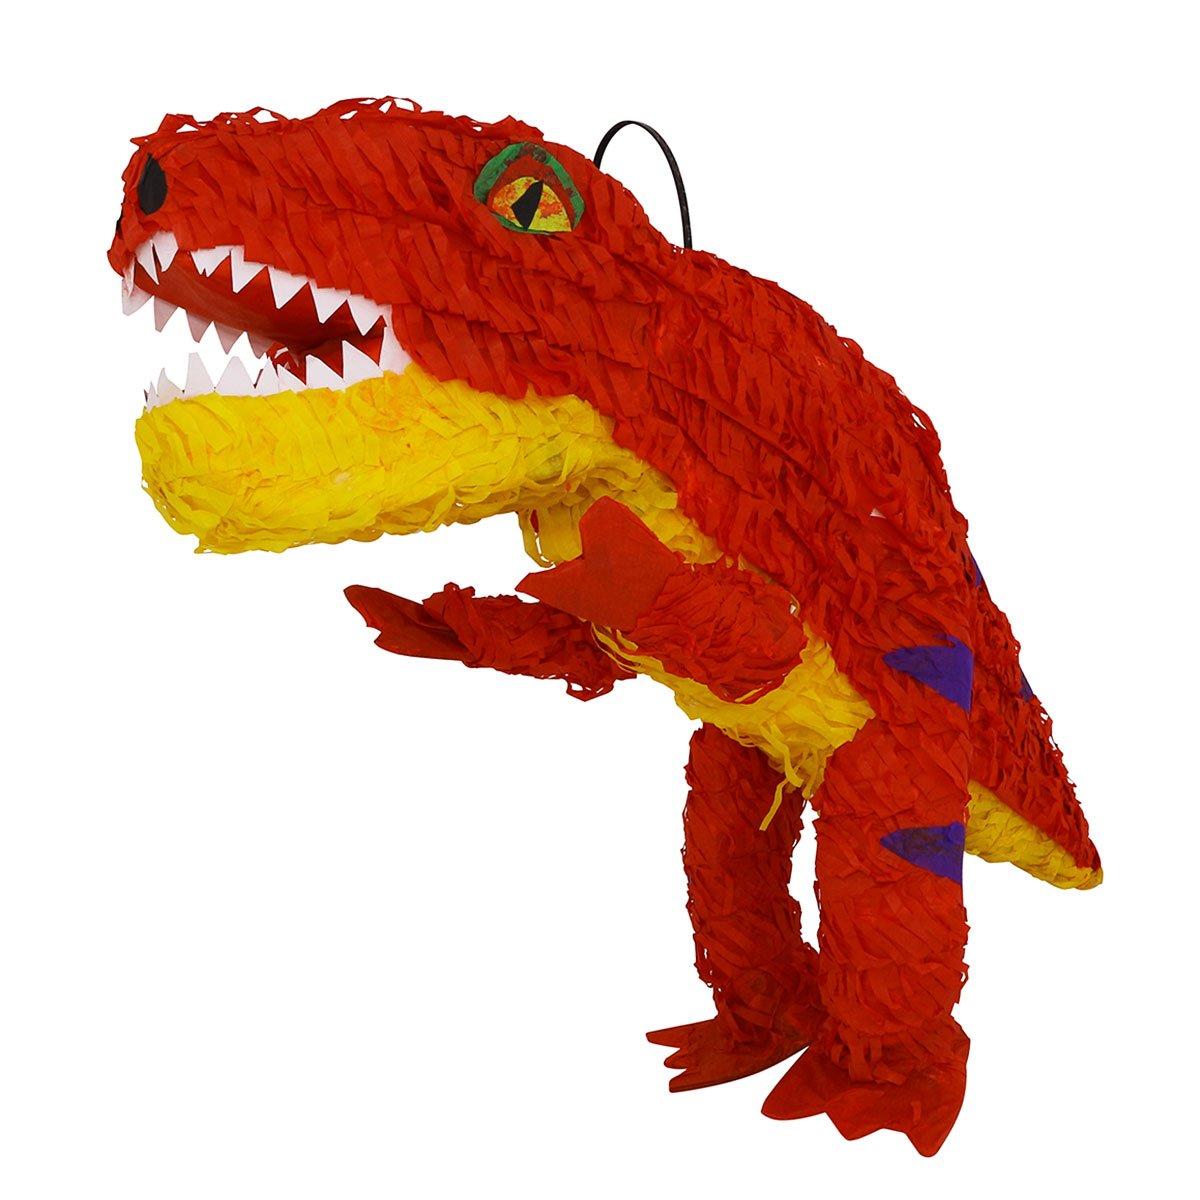 LYTIO – Pinata Full Body Orange Dino T-Rex with Purple Details Dinosaur (Piñata) – Perfect for Tyrannosaurus Dinosaur Archeologist Theme Parties, Décor and Photo Prop. by LYTIO